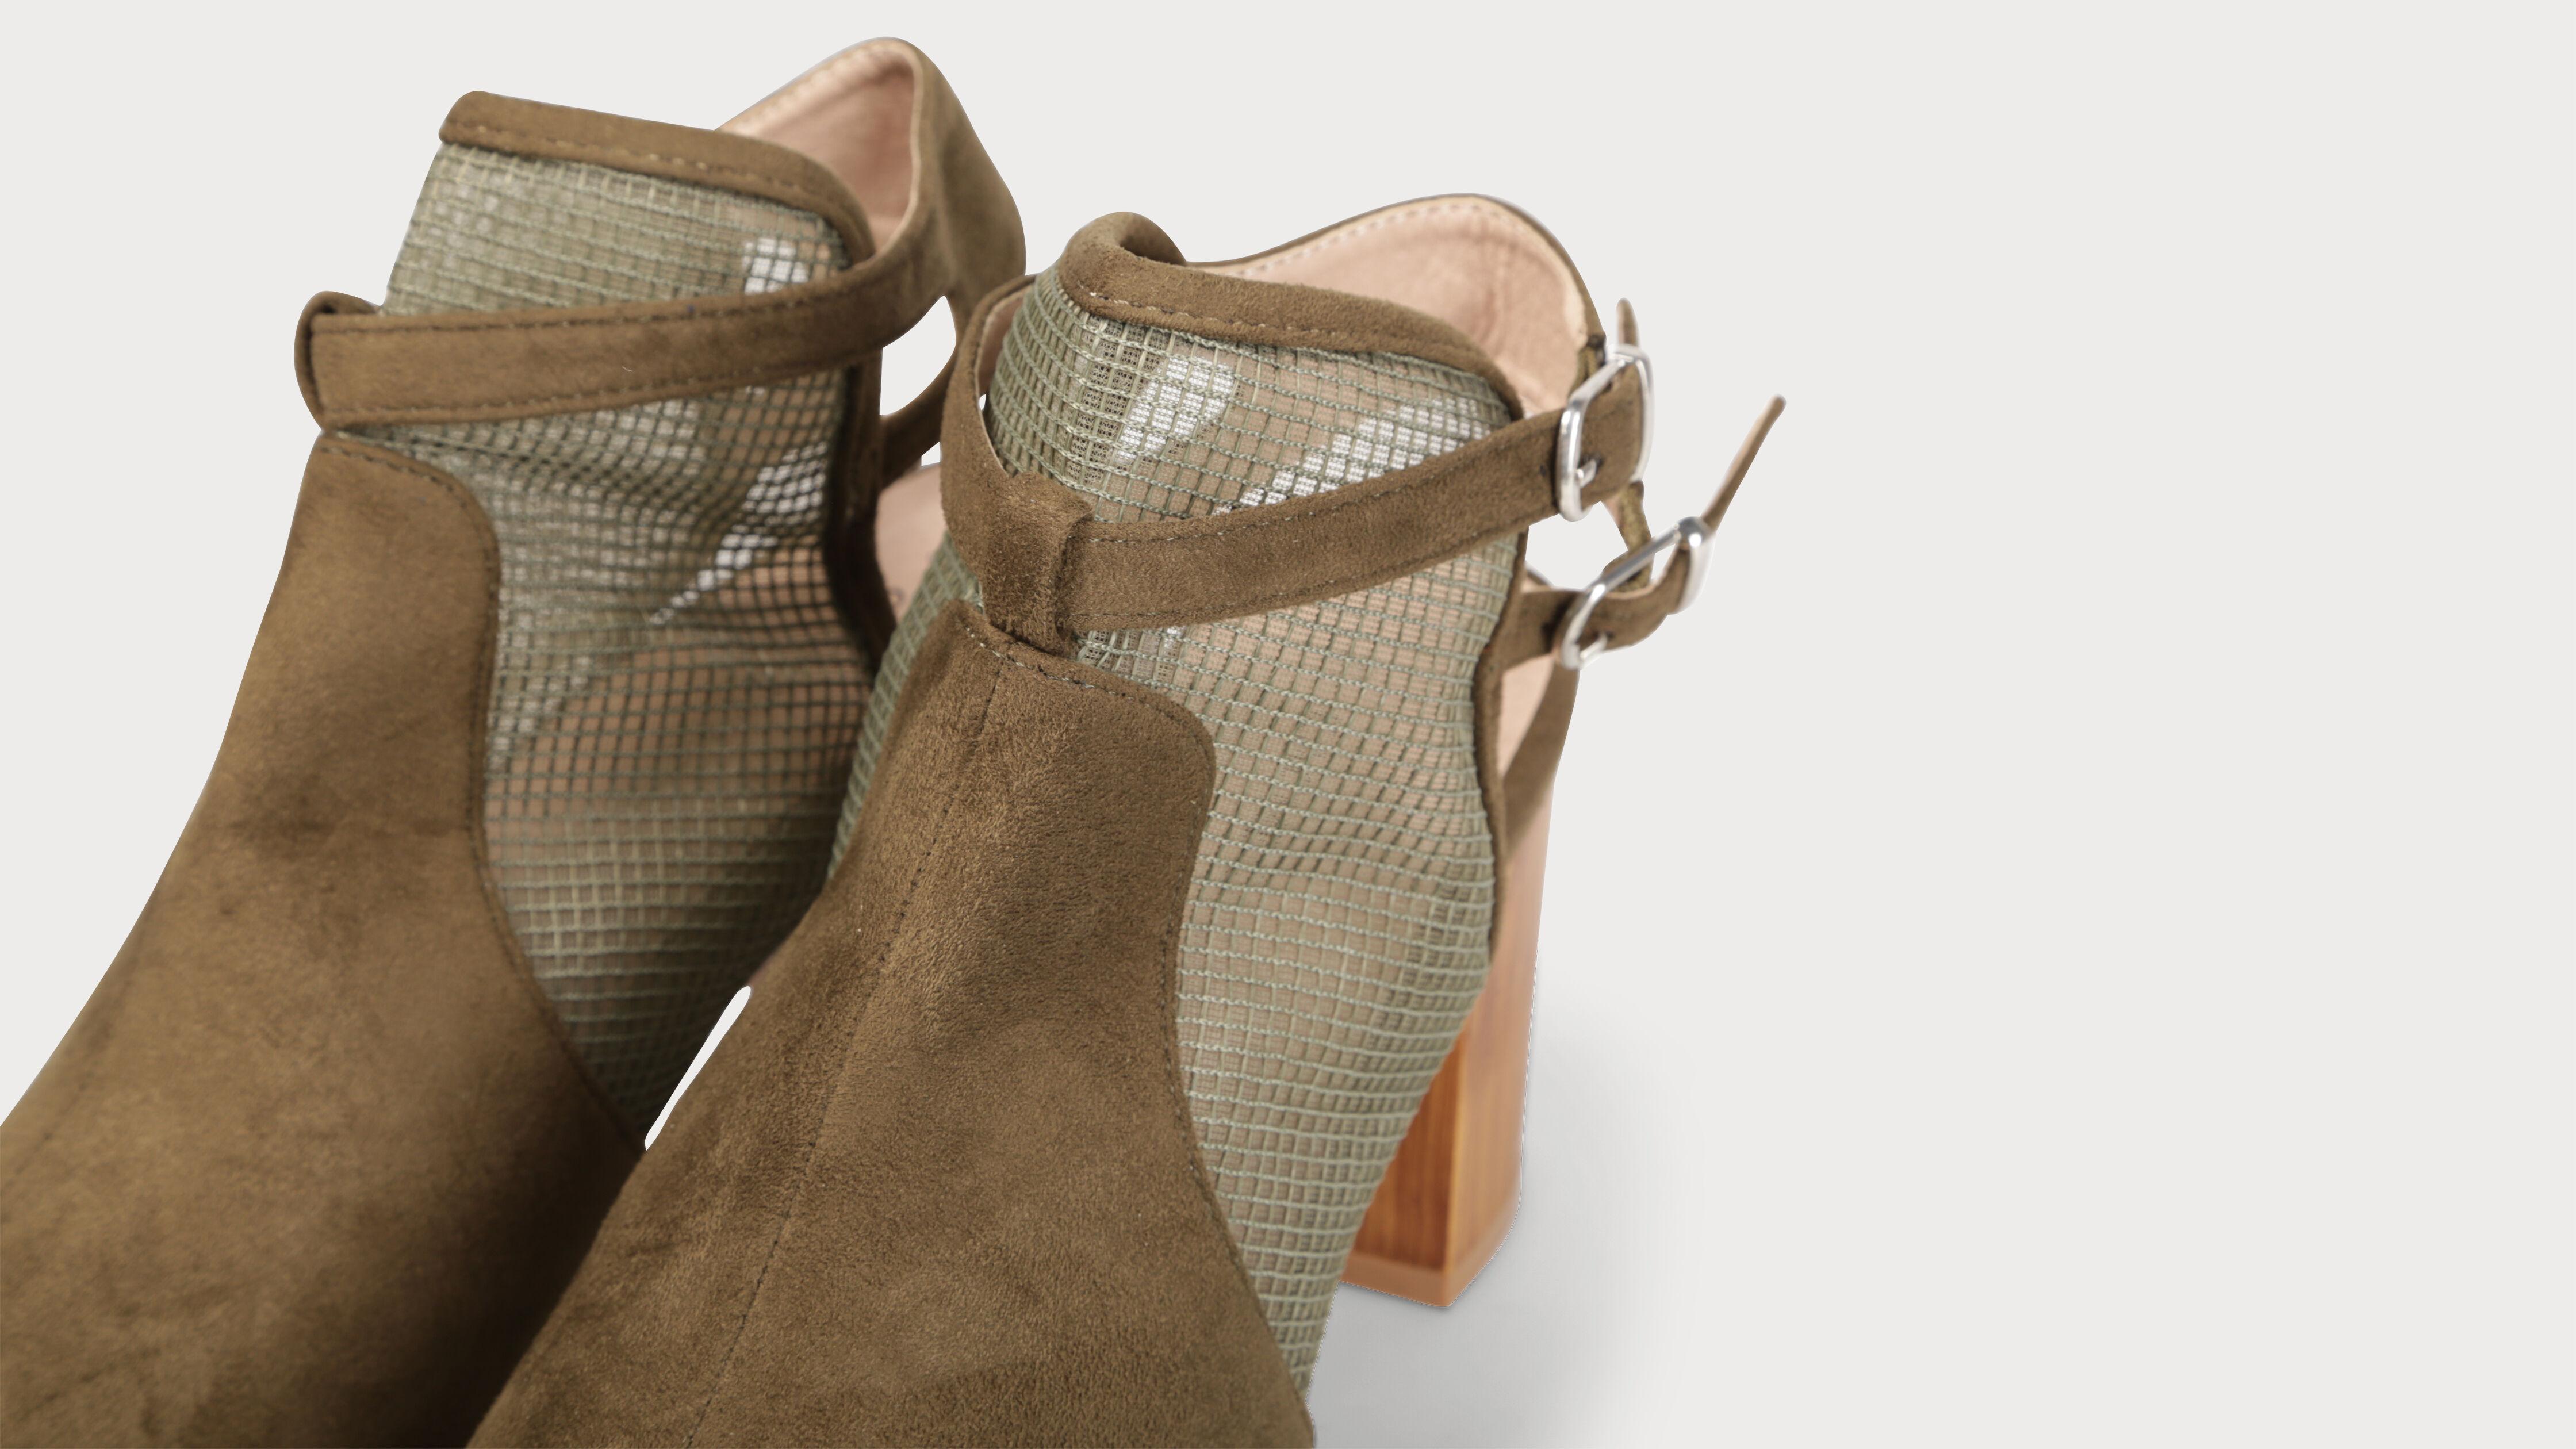 FemmeVib's Sandales Matière Carrés Talons Ajourée Kaki Vert XwOZiPTku